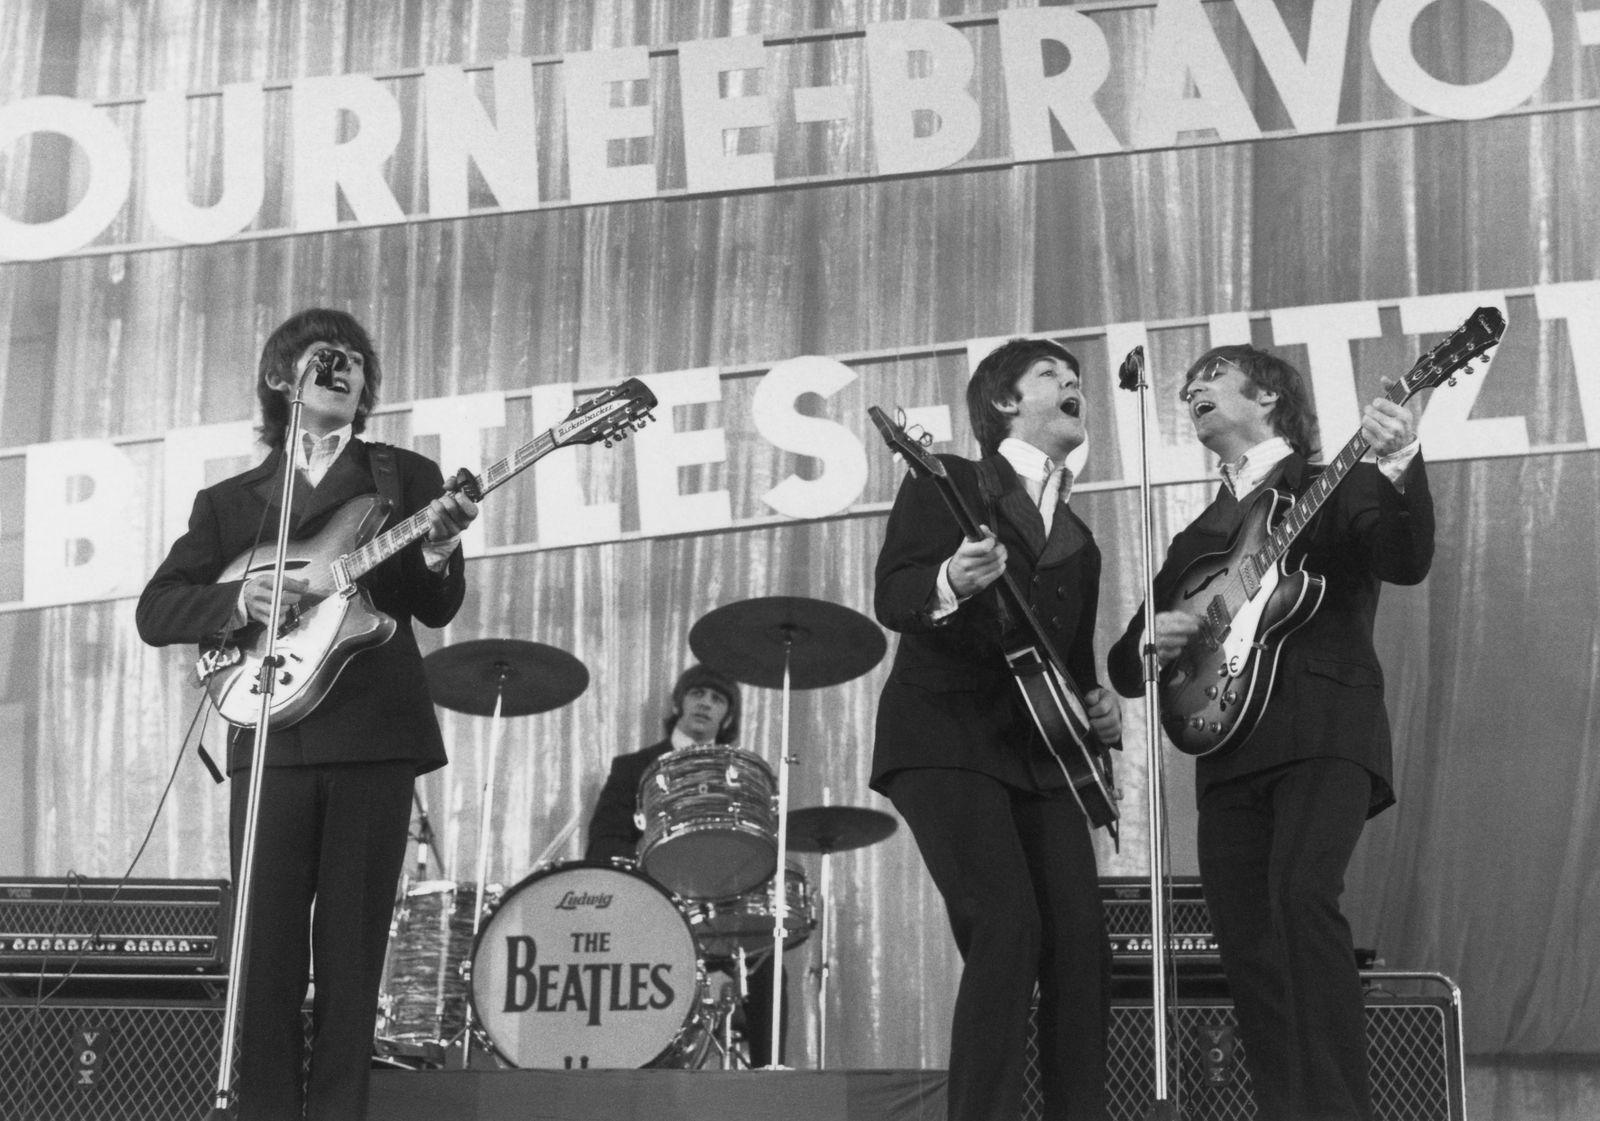 Beatles in Hamburg - Bravo-Beatles-Blitztournee